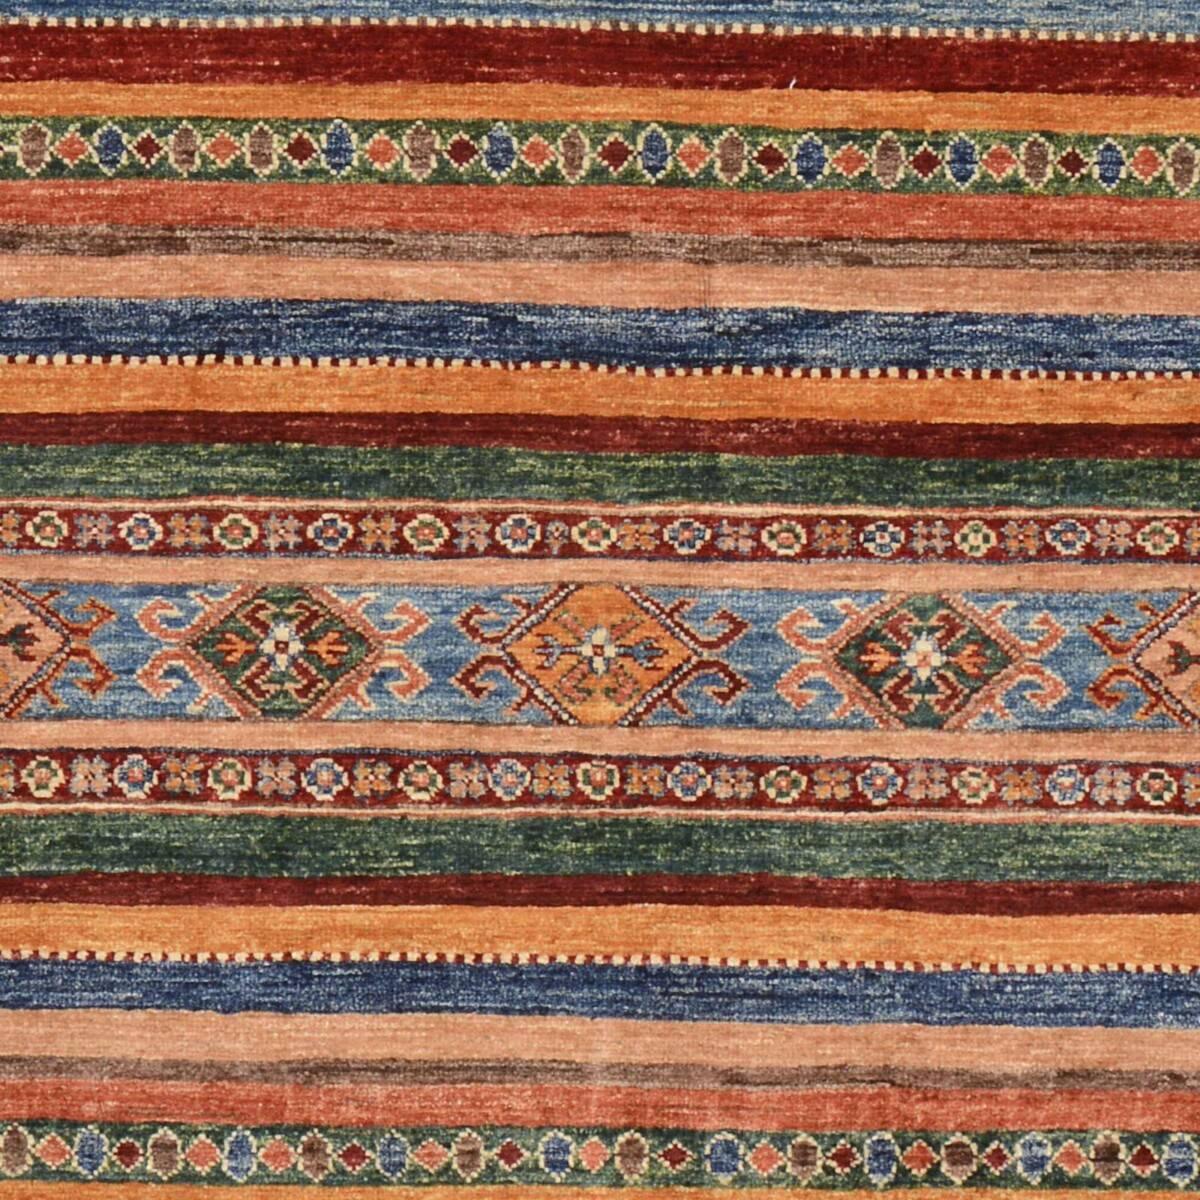 Dywan Wełniany Samarkand Mamlook 209 x 158 74048